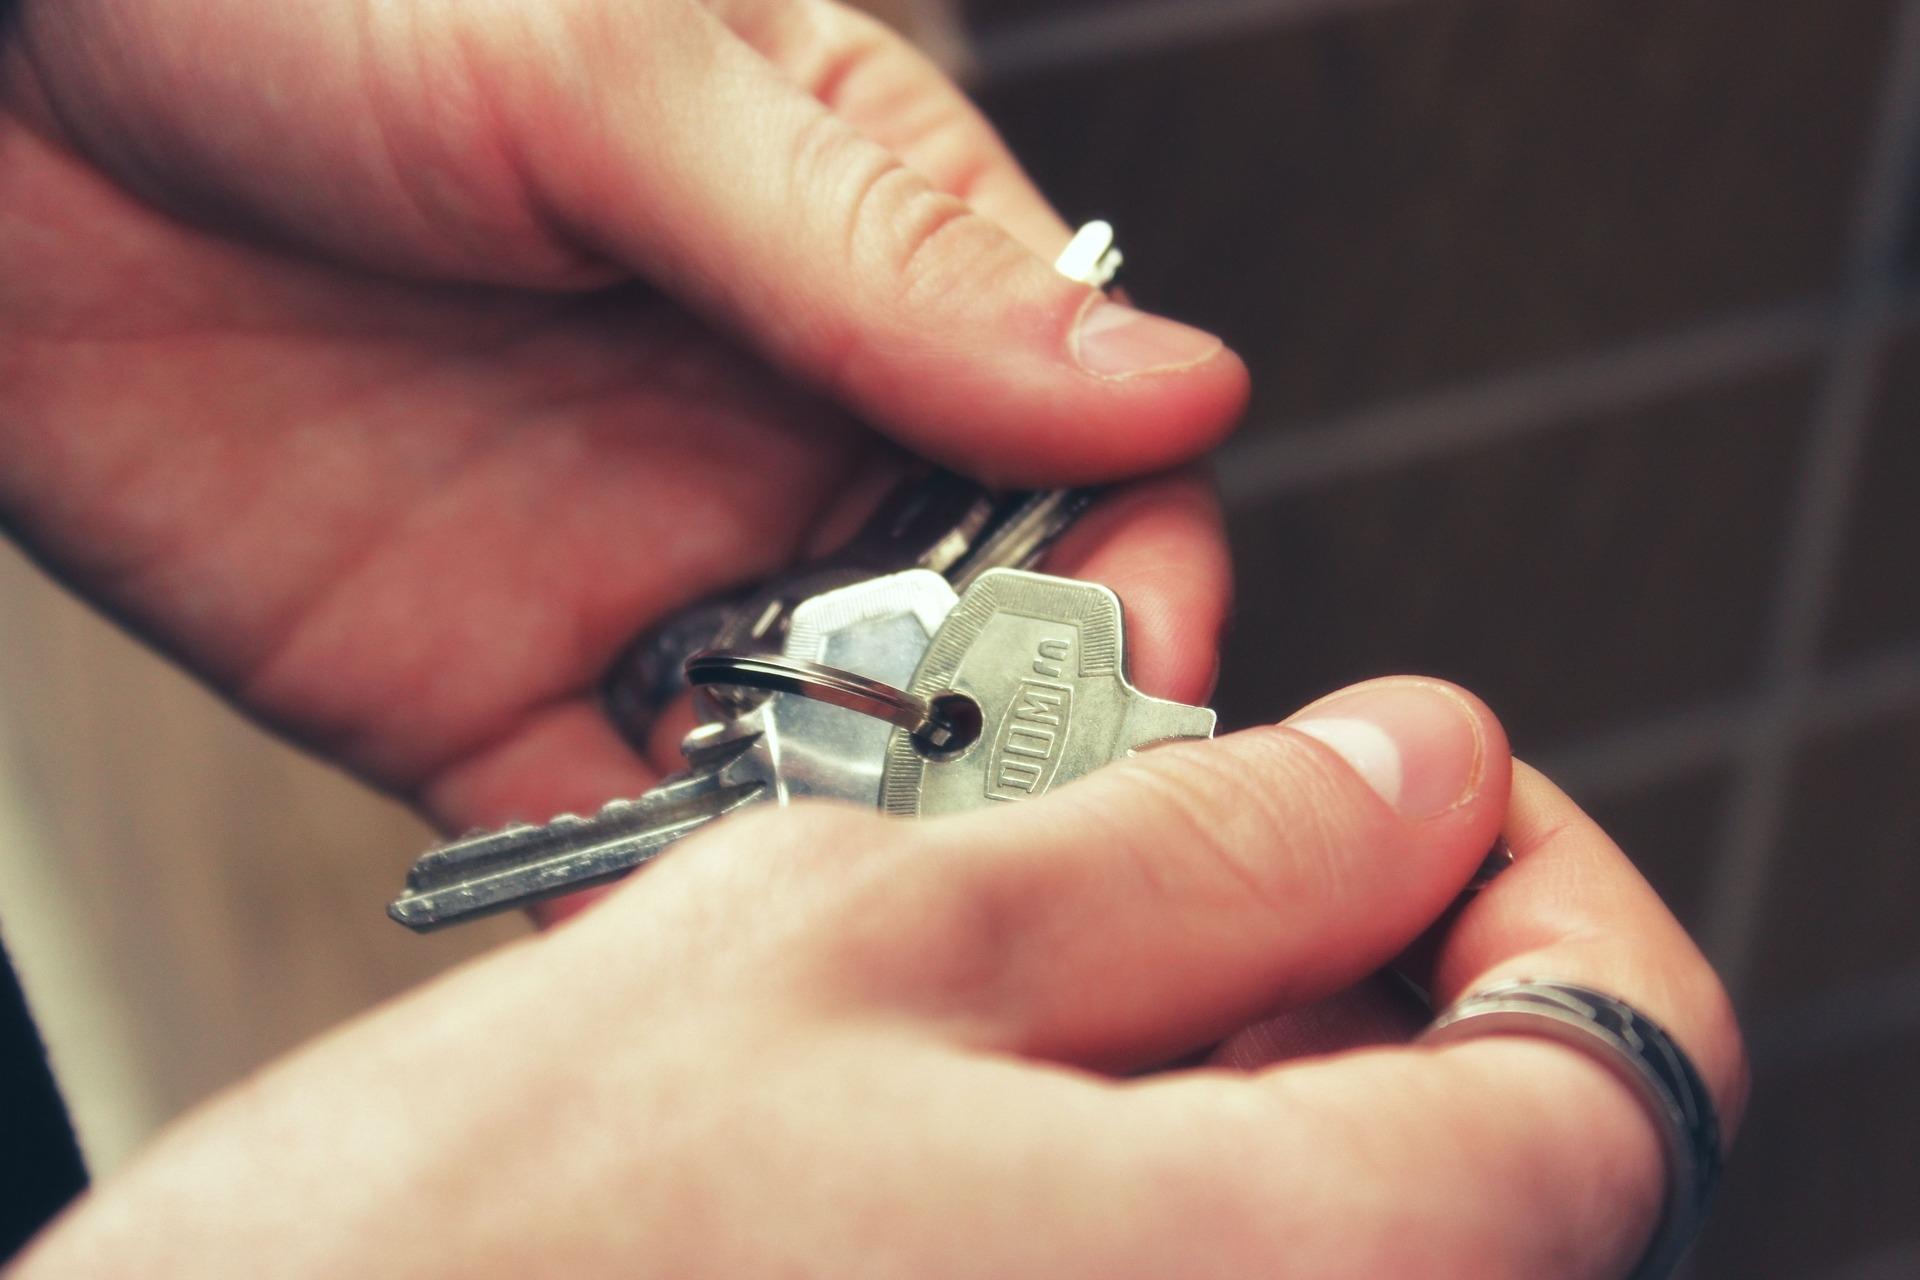 Keys - 2251770 - 1920